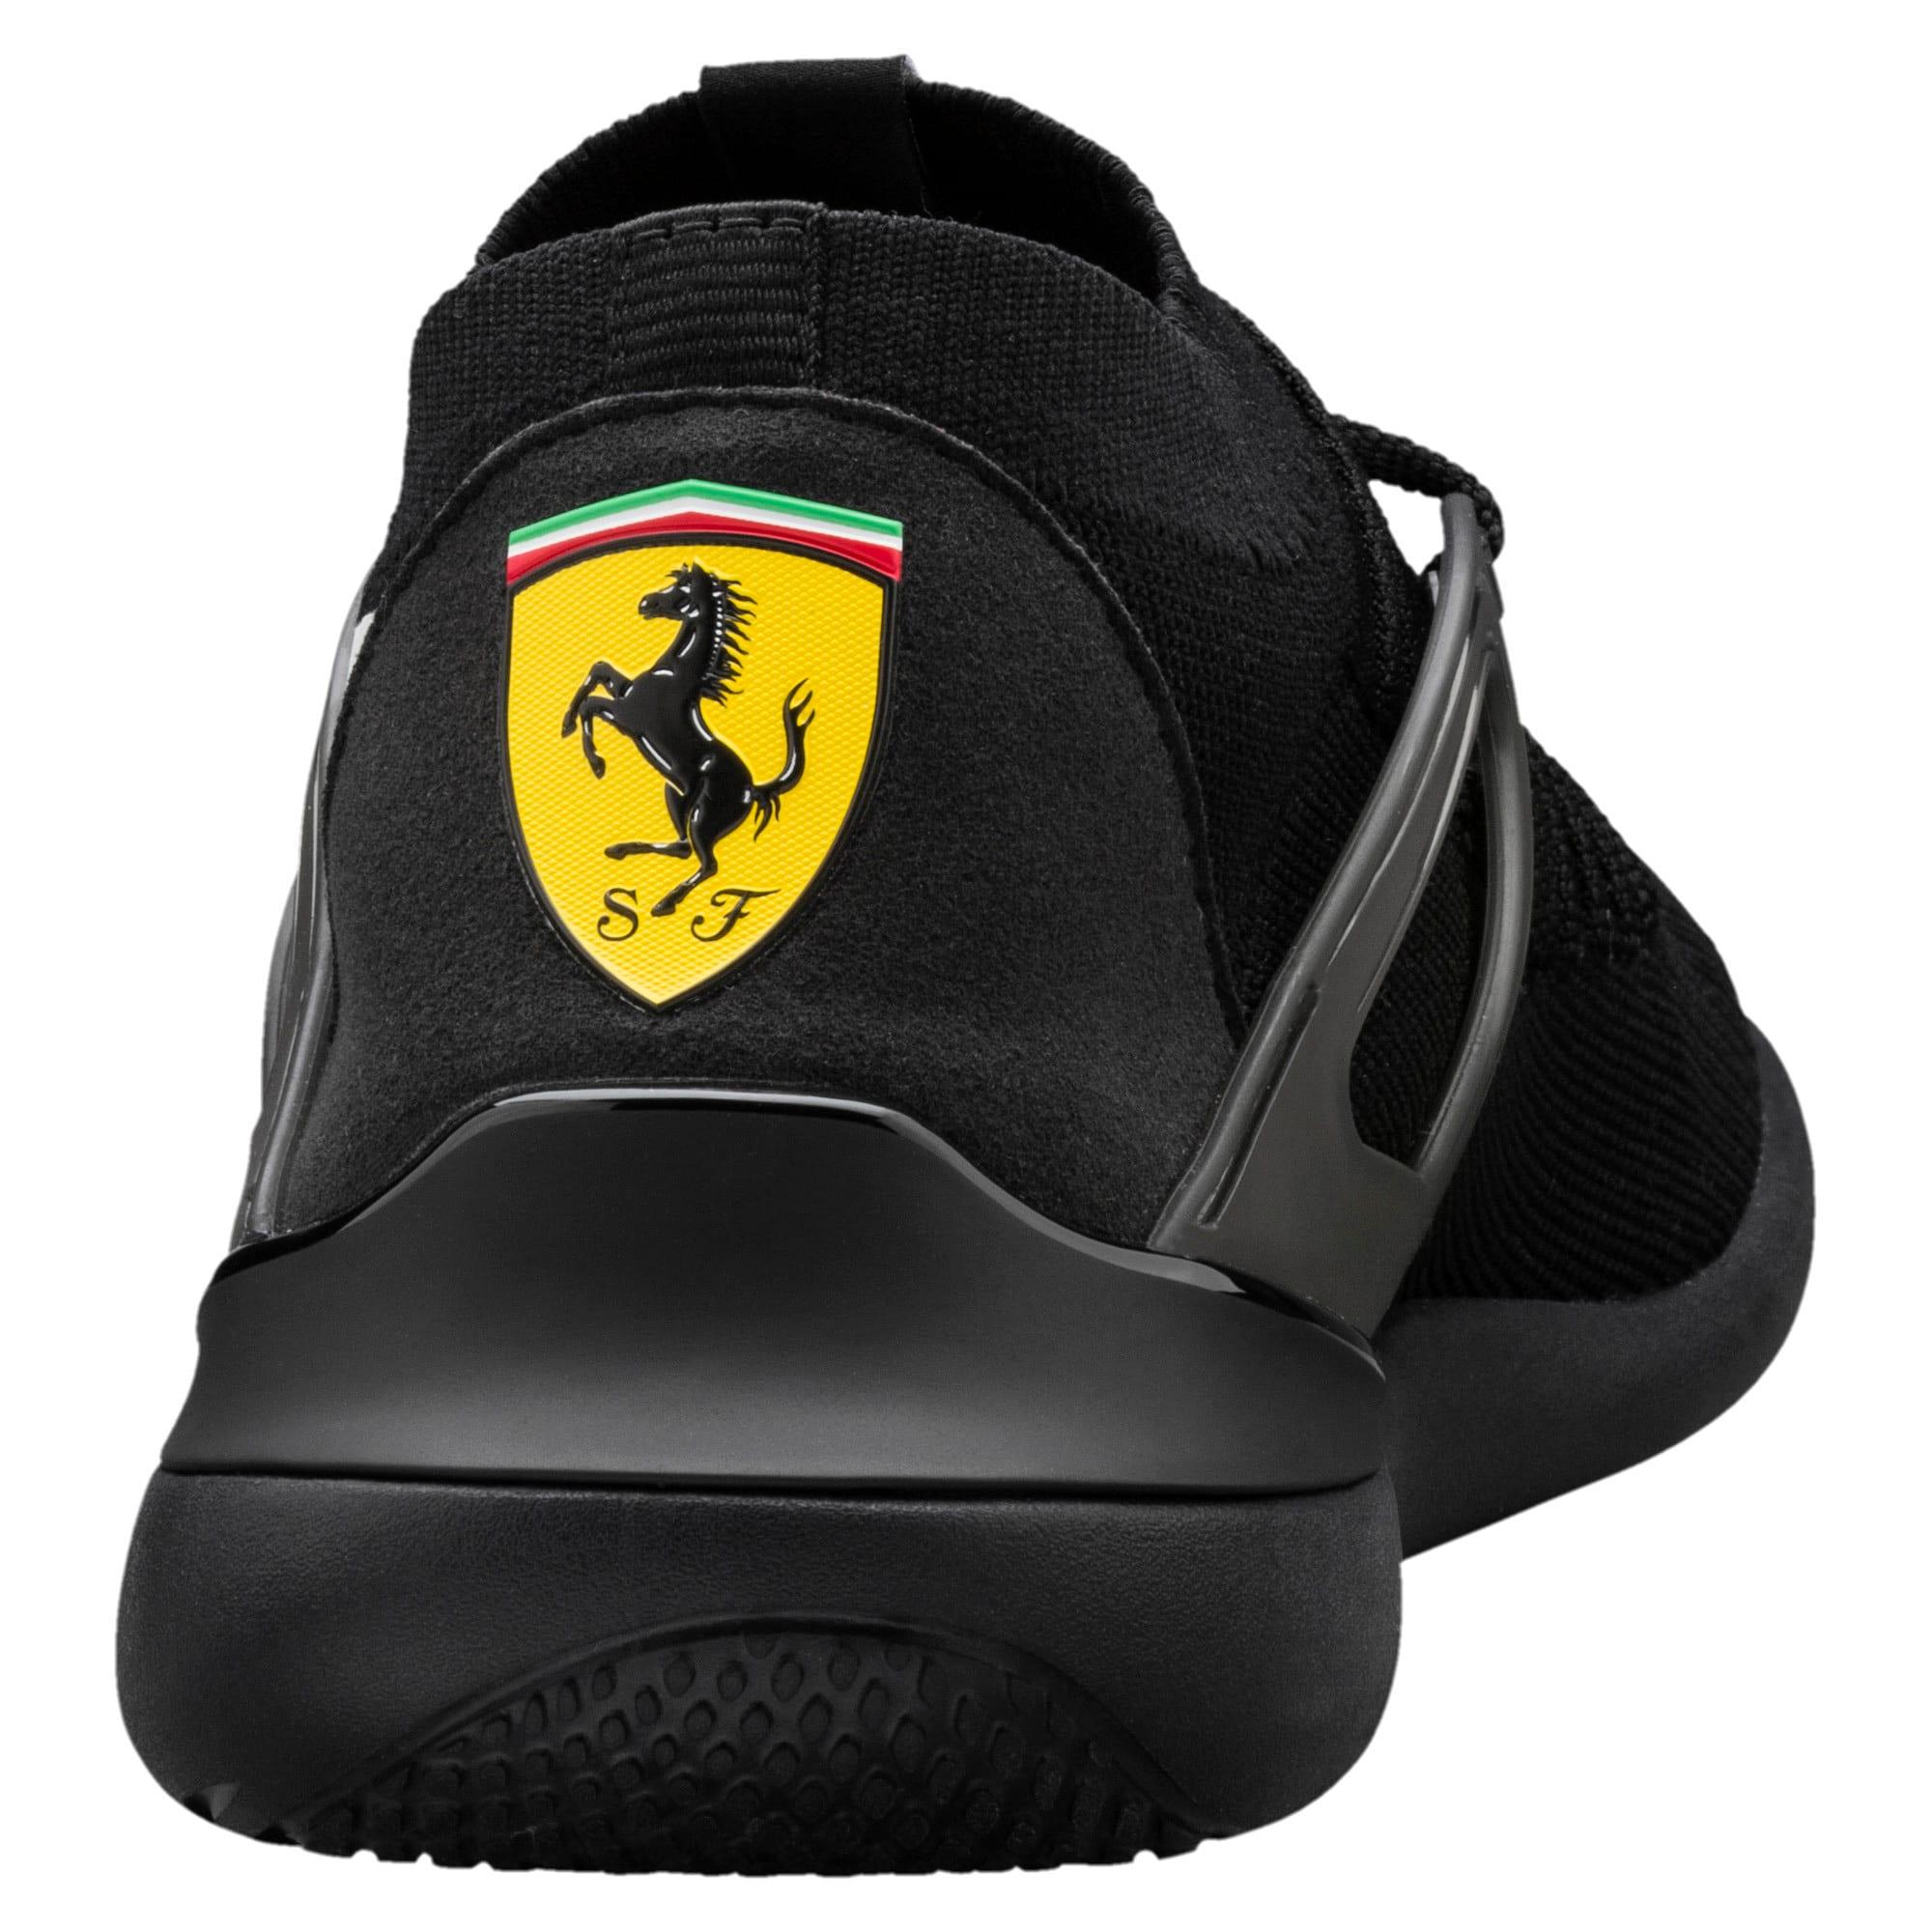 Thumbnail 4 of Ferrari Evo Cat Sock Lace Trainers, Puma Black-Puma White-Black, medium-IND